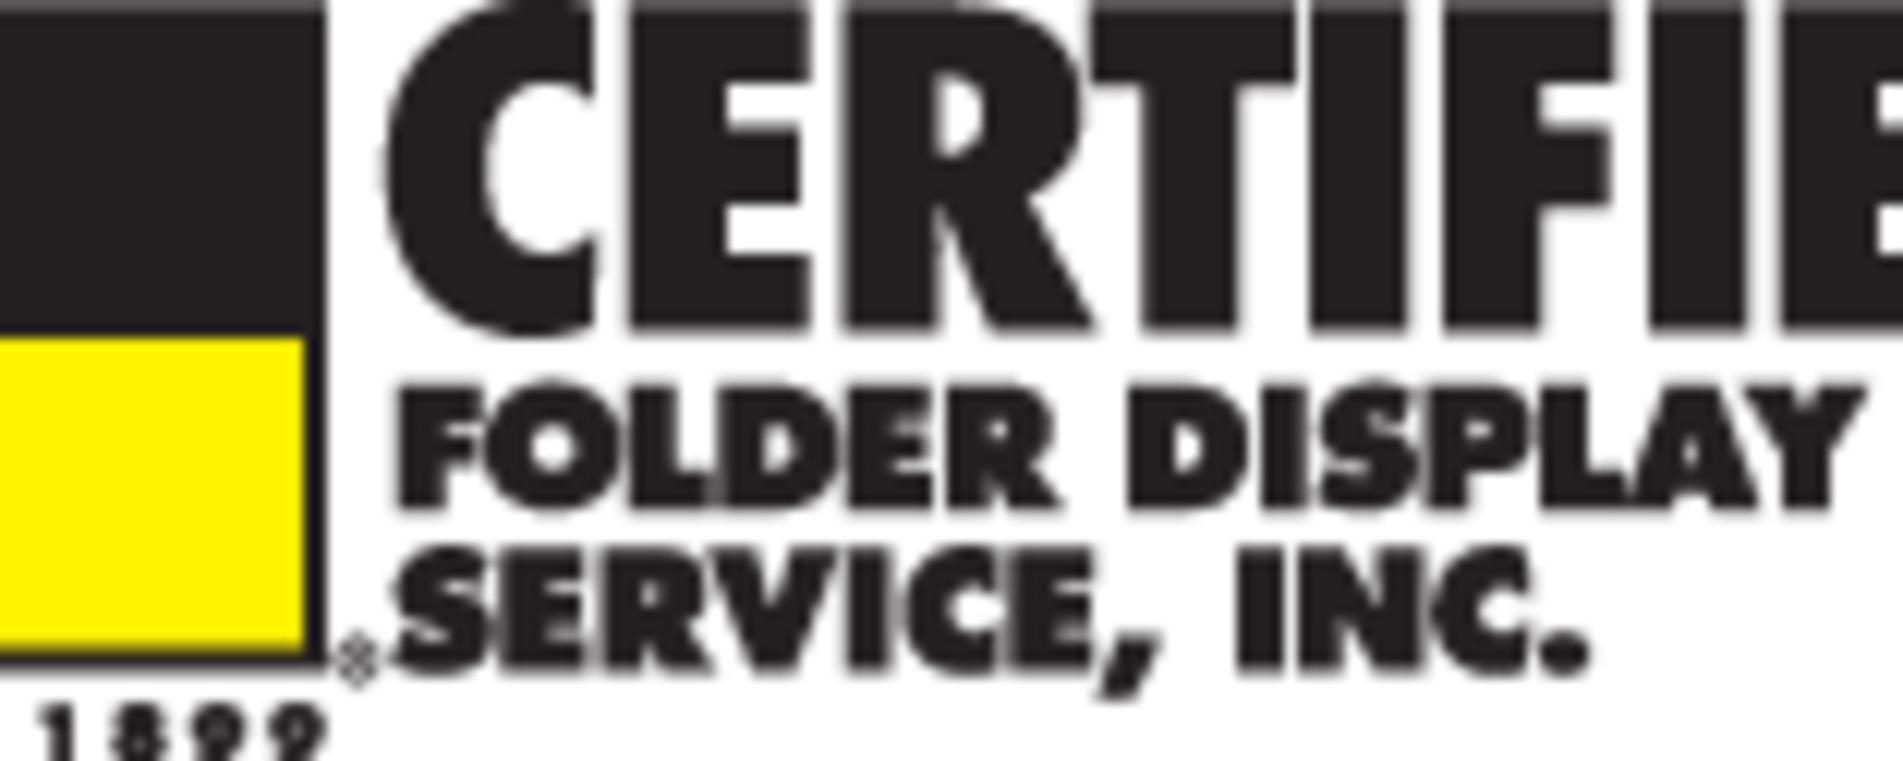 Logo - Certified Folder Display Services, Inc.